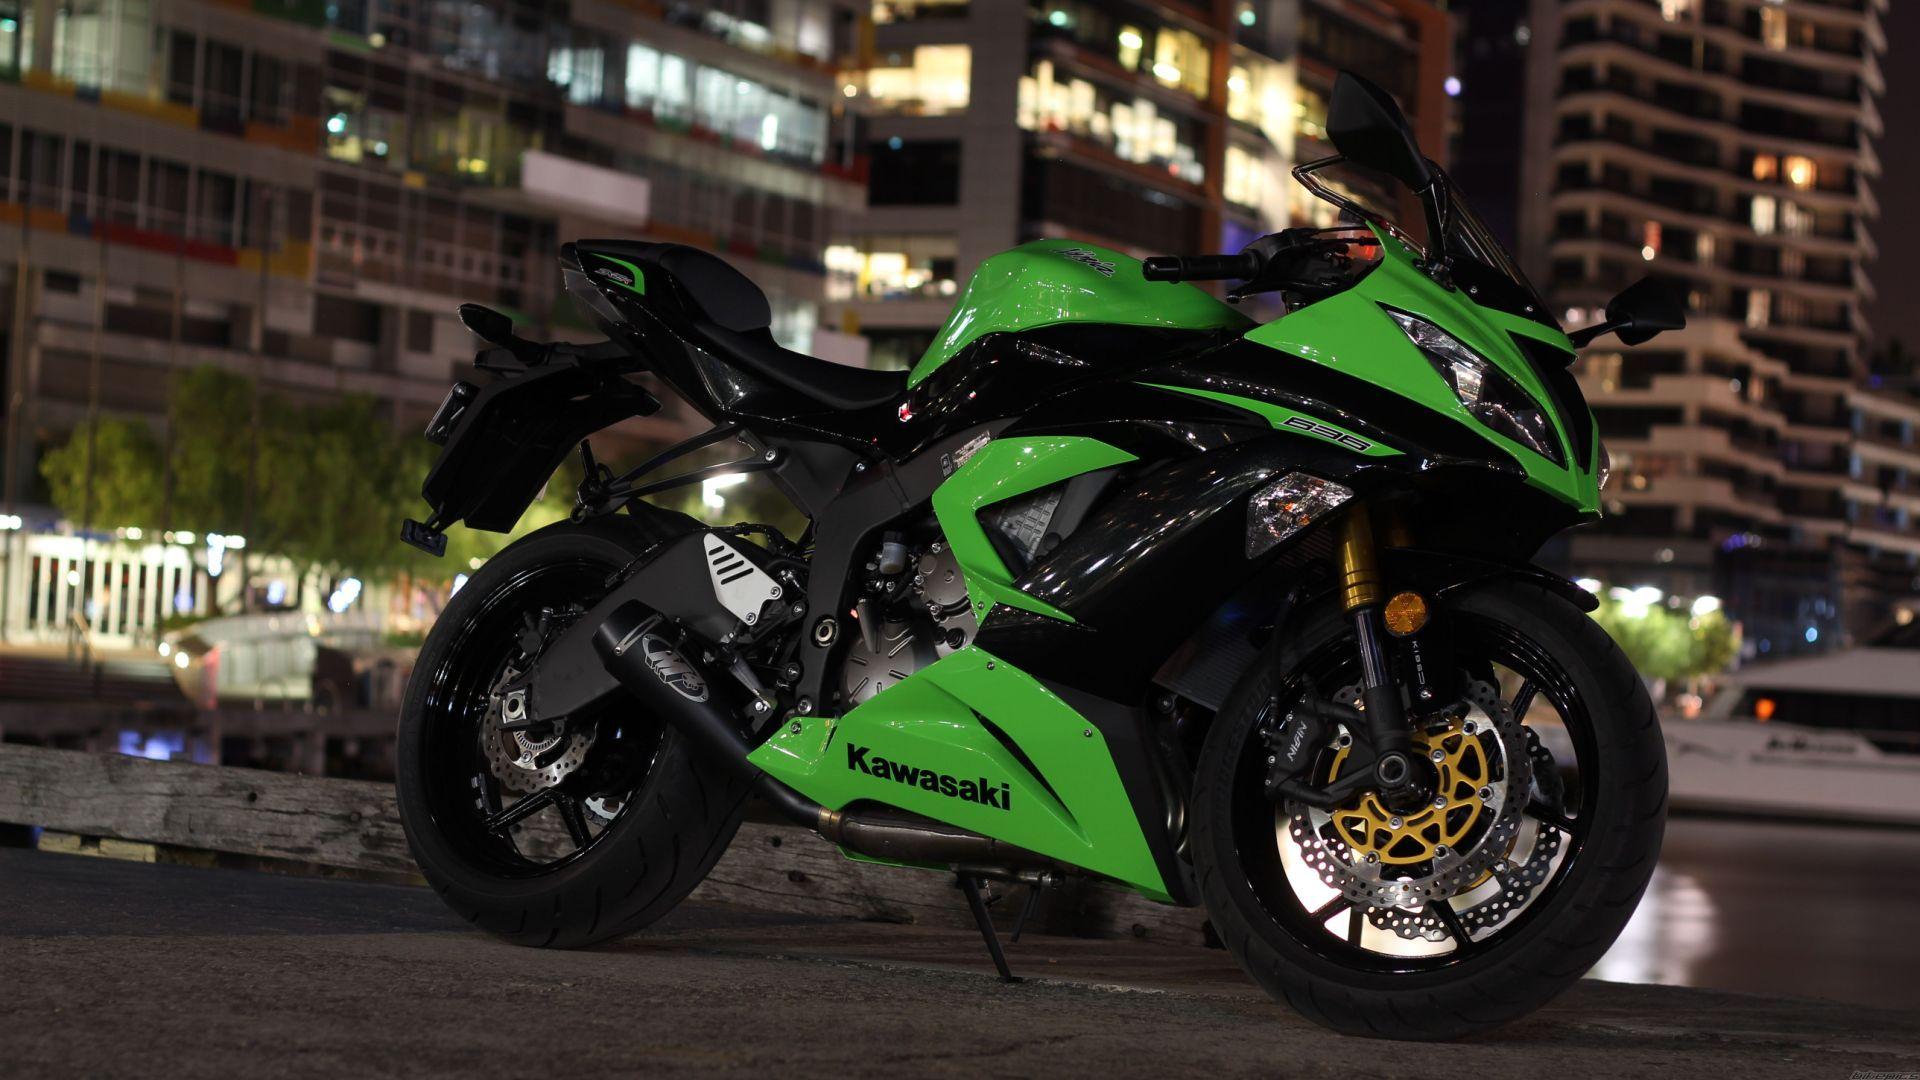 Kawasaki ninja zxr facut varza YouTube